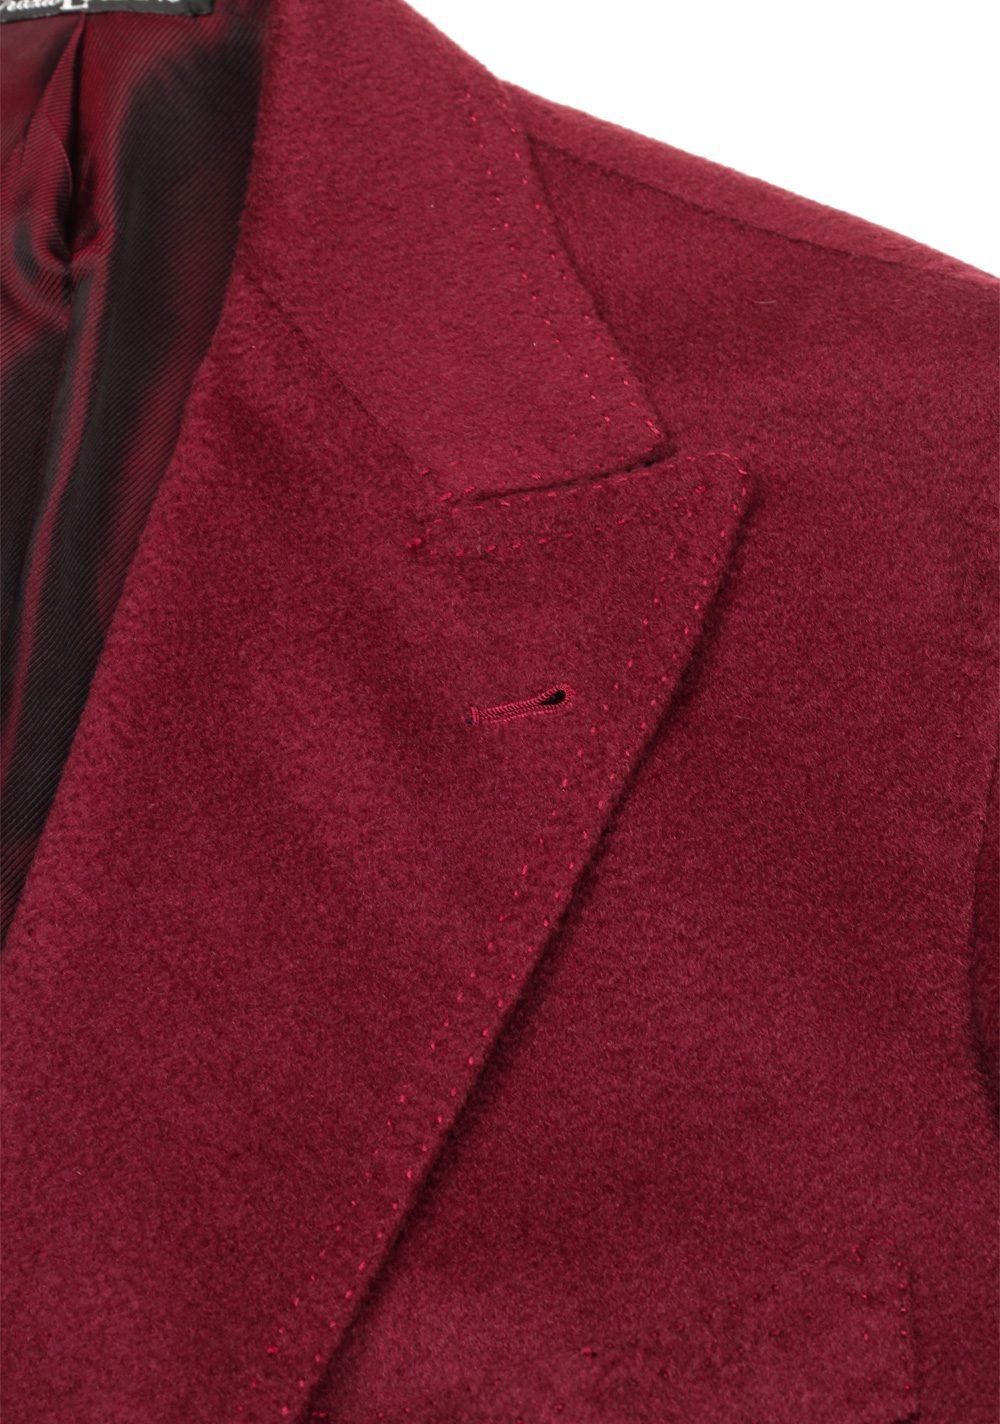 Orazio Luciano Burgundy Double Breasted Over Coat Size 52 / 42R U.S. In Cashmere | Costume Limité